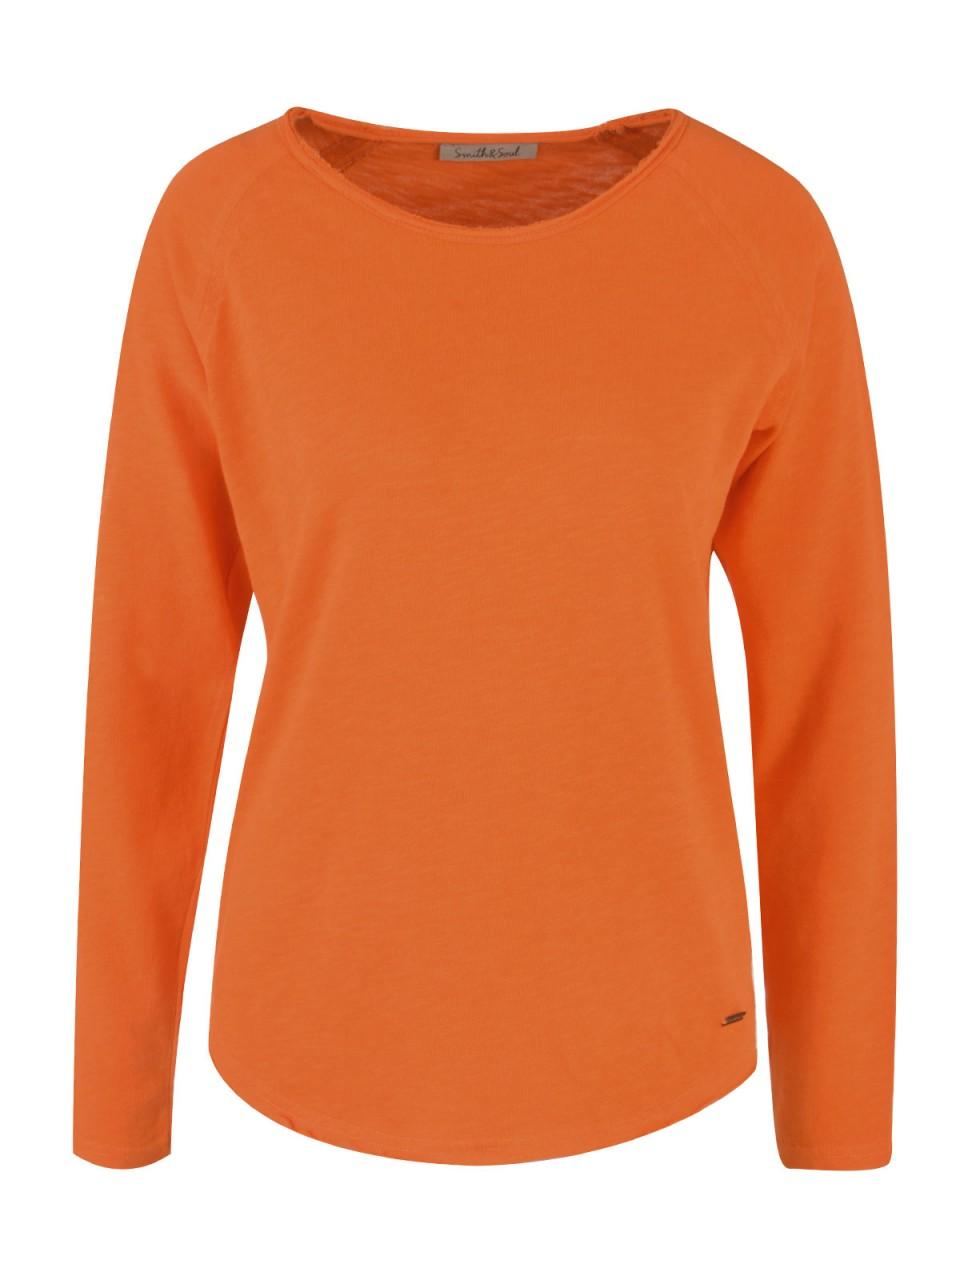 Oberteile - SMITH SOUL Damen Shirt, orange  - Onlineshop Designermode.com